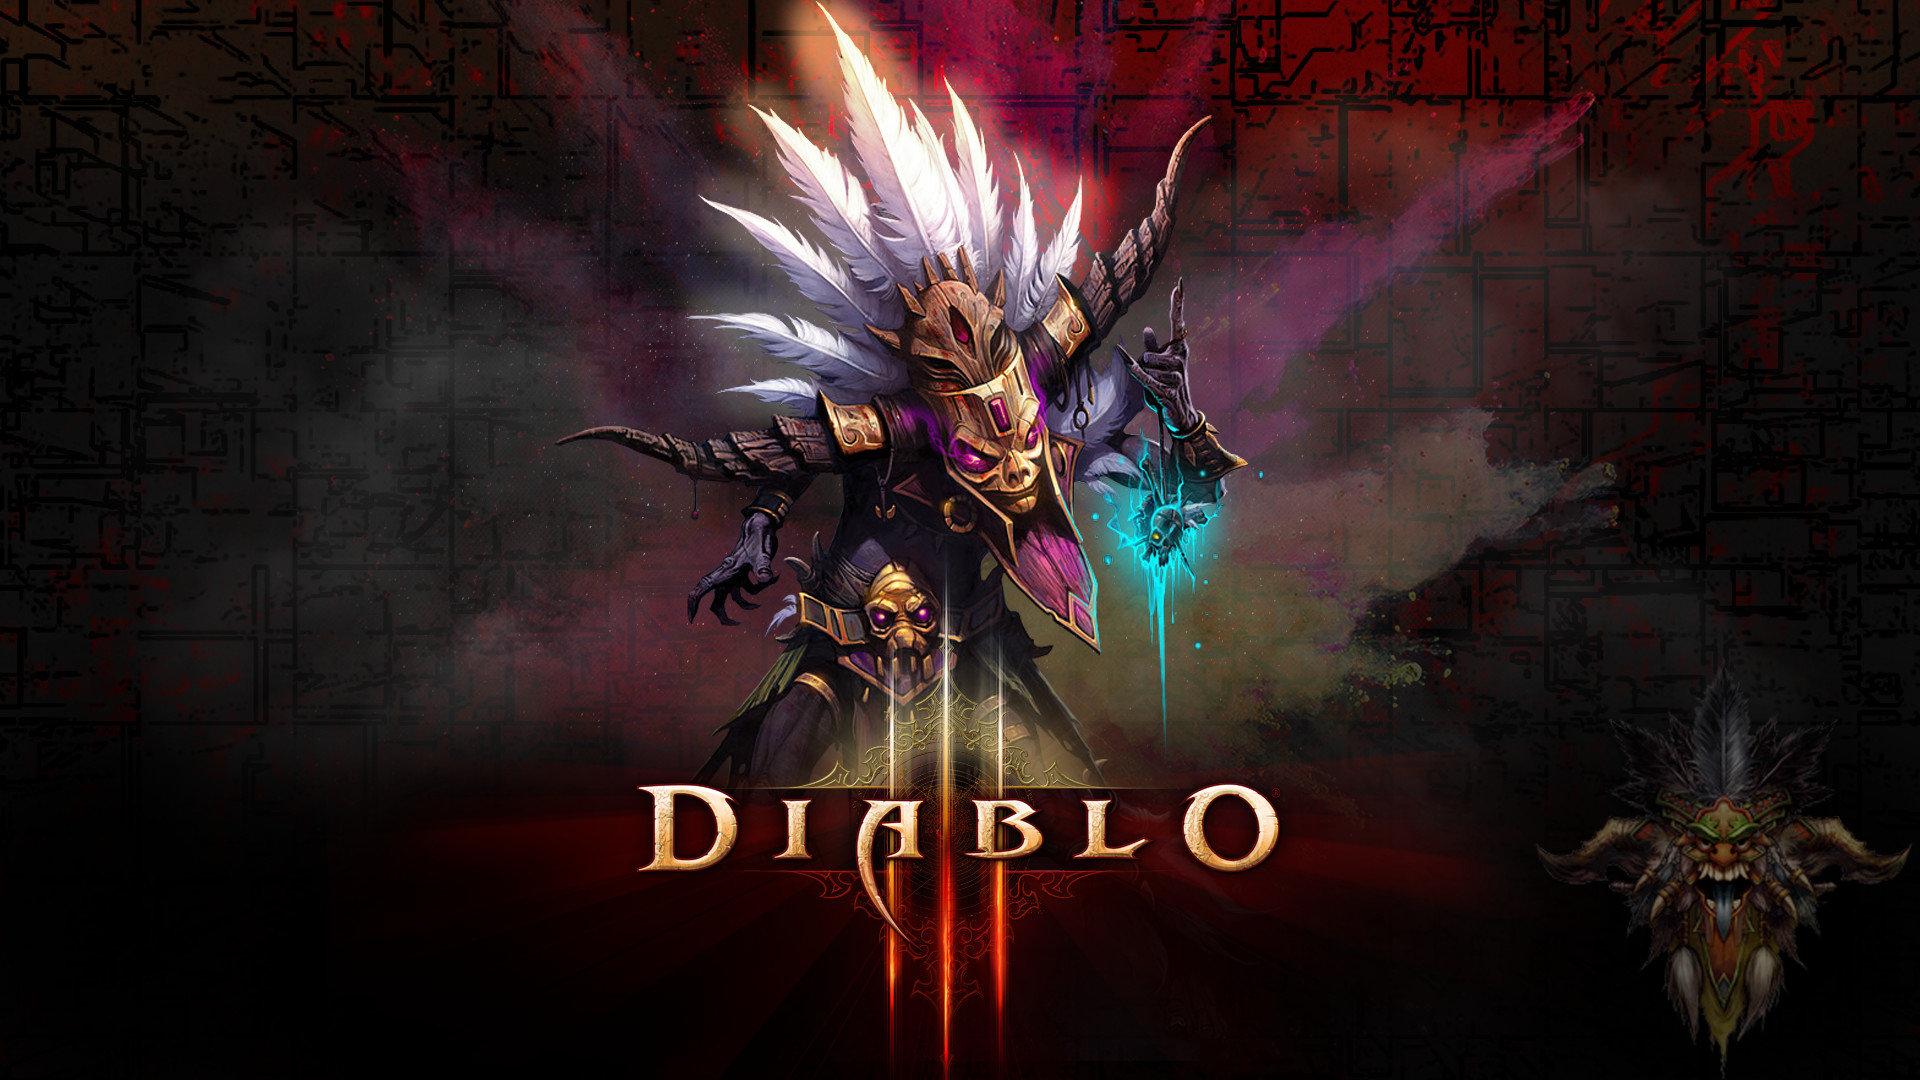 Diablo III  № 1896340 бесплатно